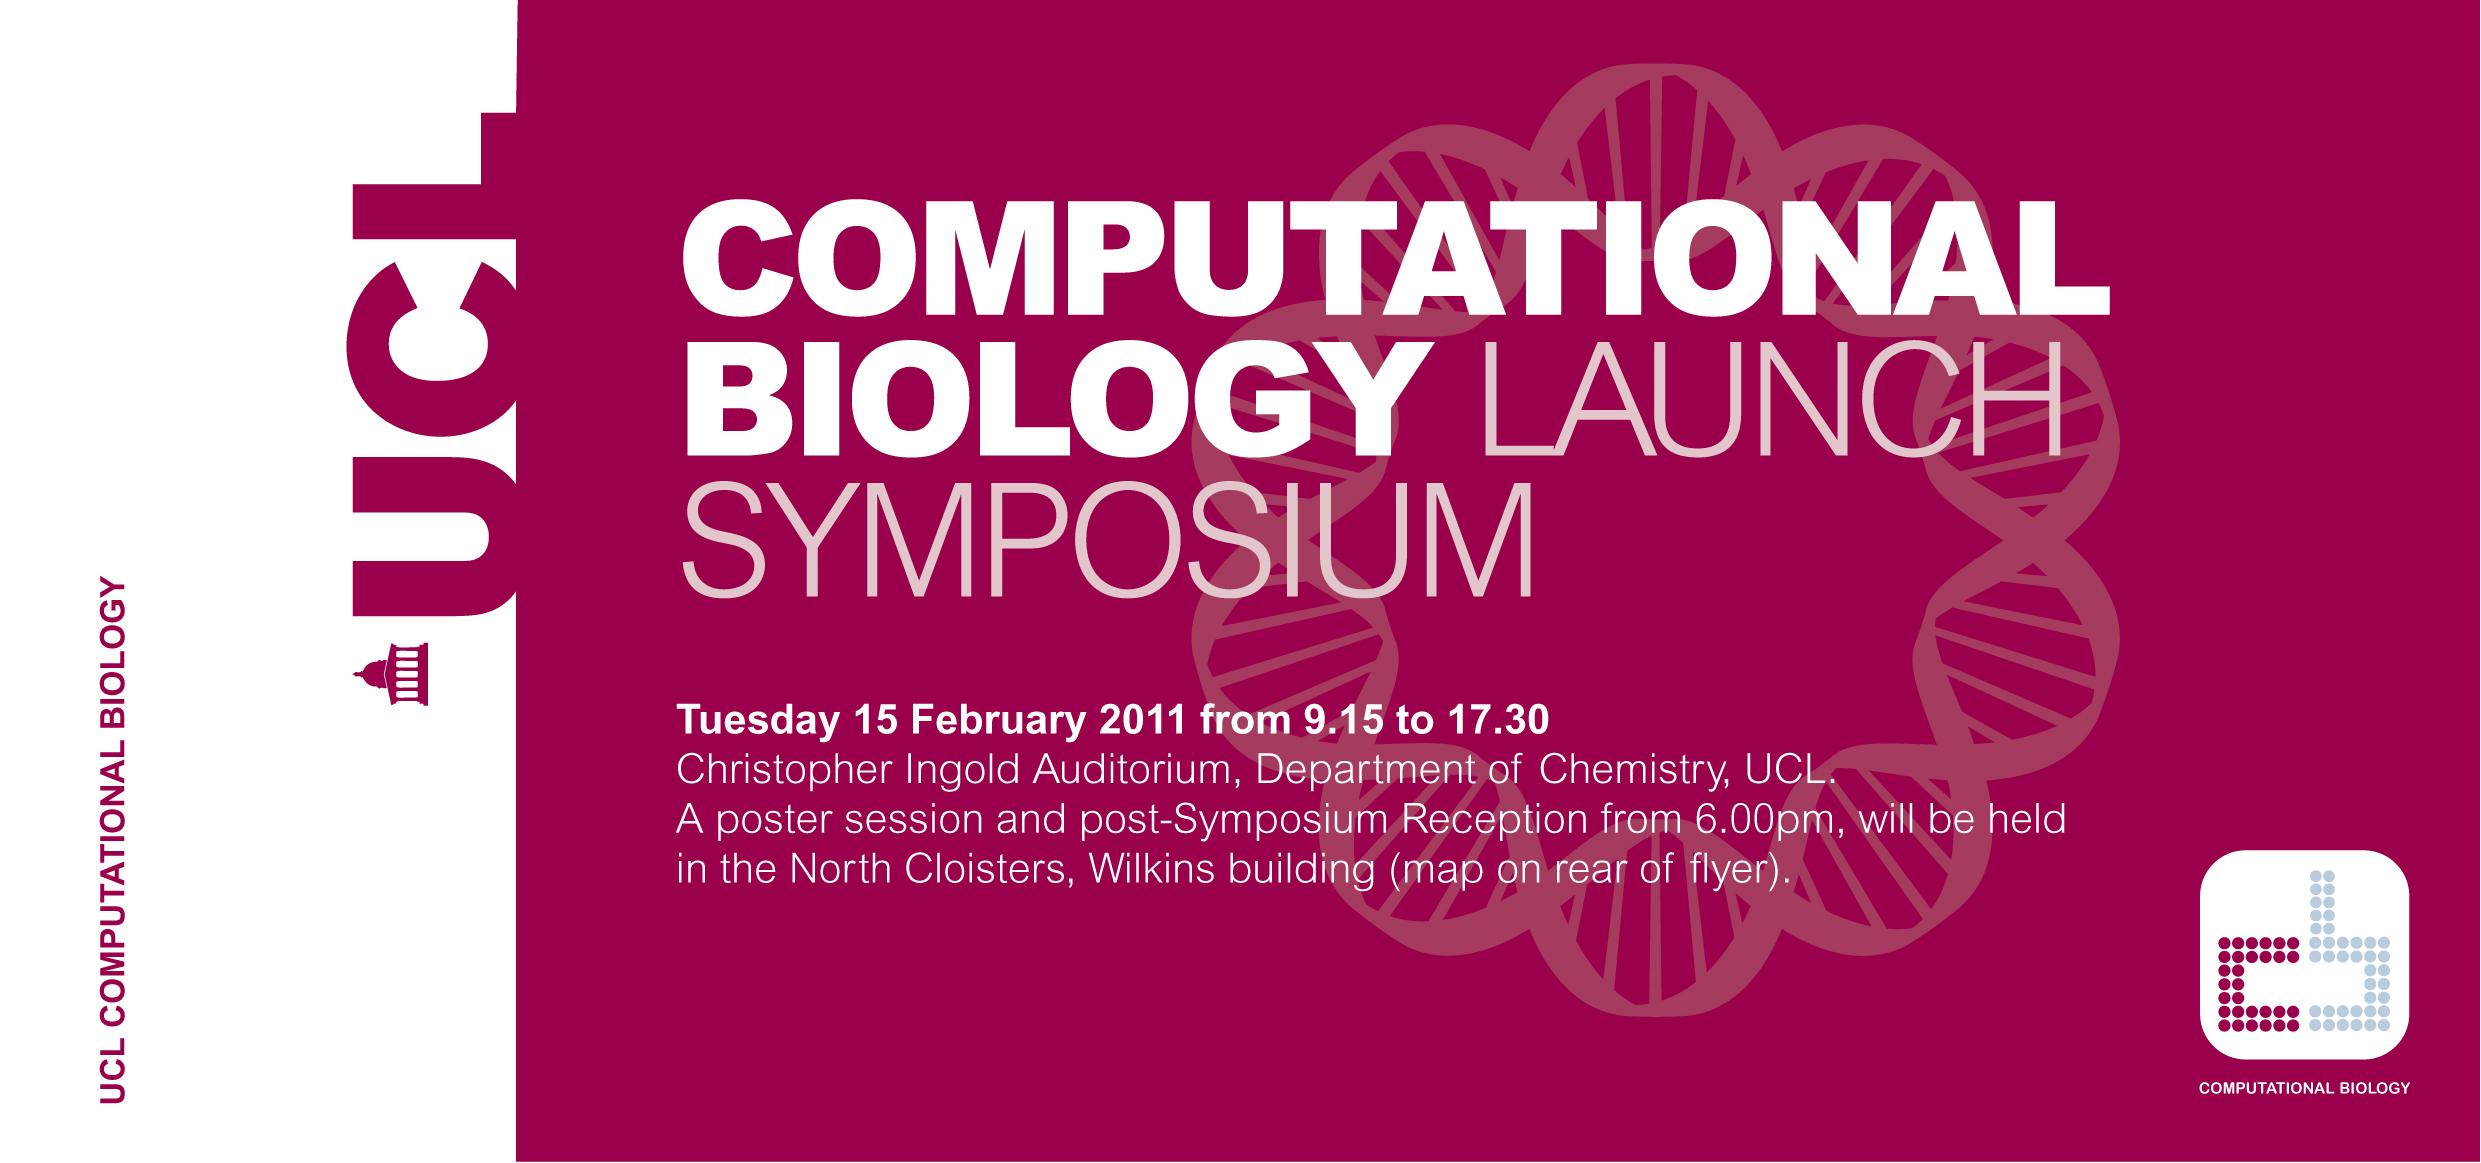 UCL Computational Biology Symposium Flyer